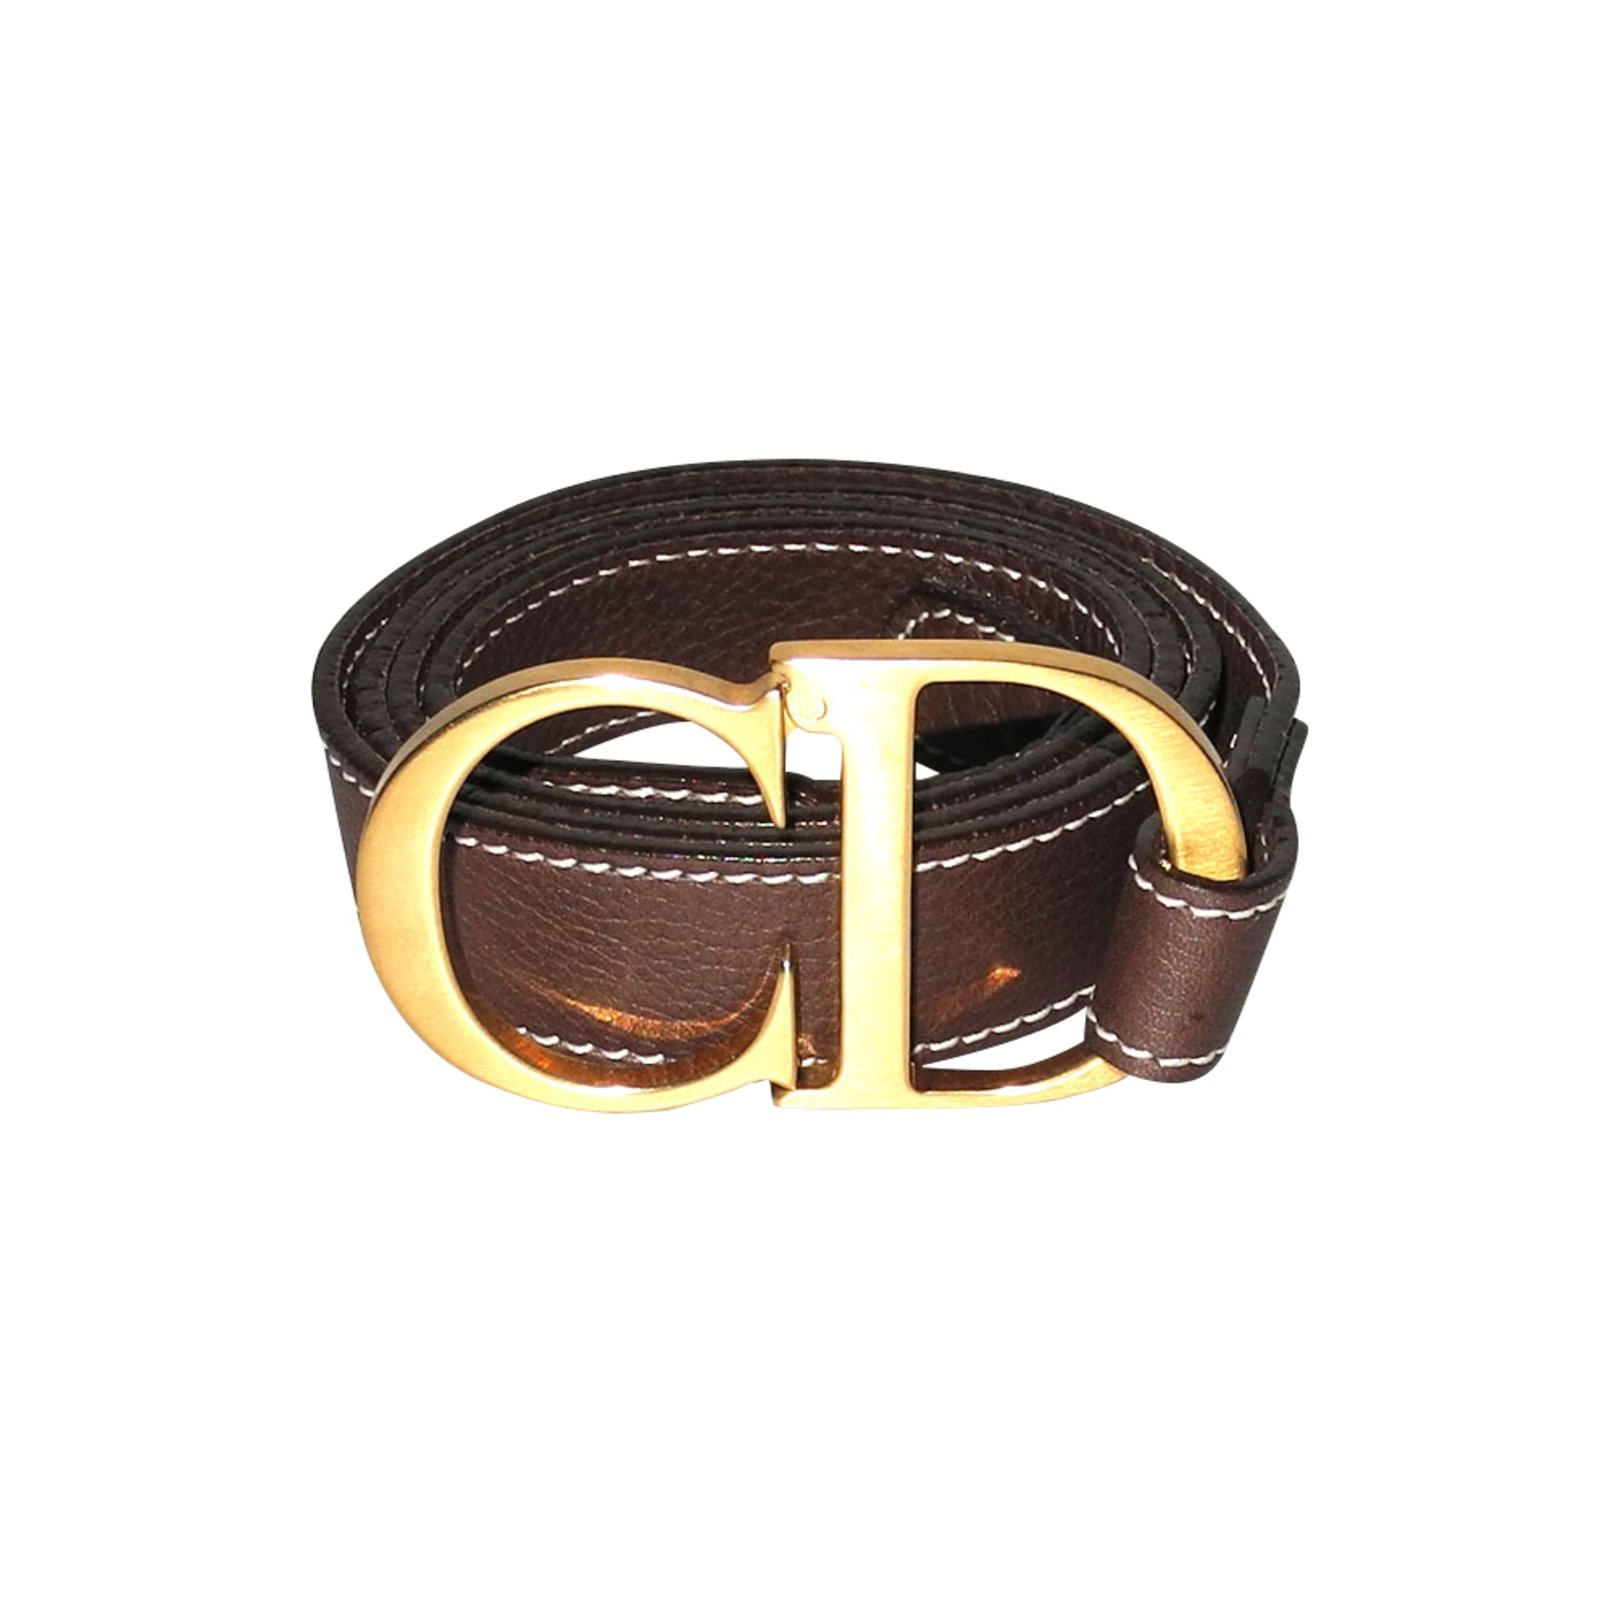 chaussures de sport 124ee a2060 Christian Dior ceinture fine en cuir marron, logo CD en métal doré brossé  superbe